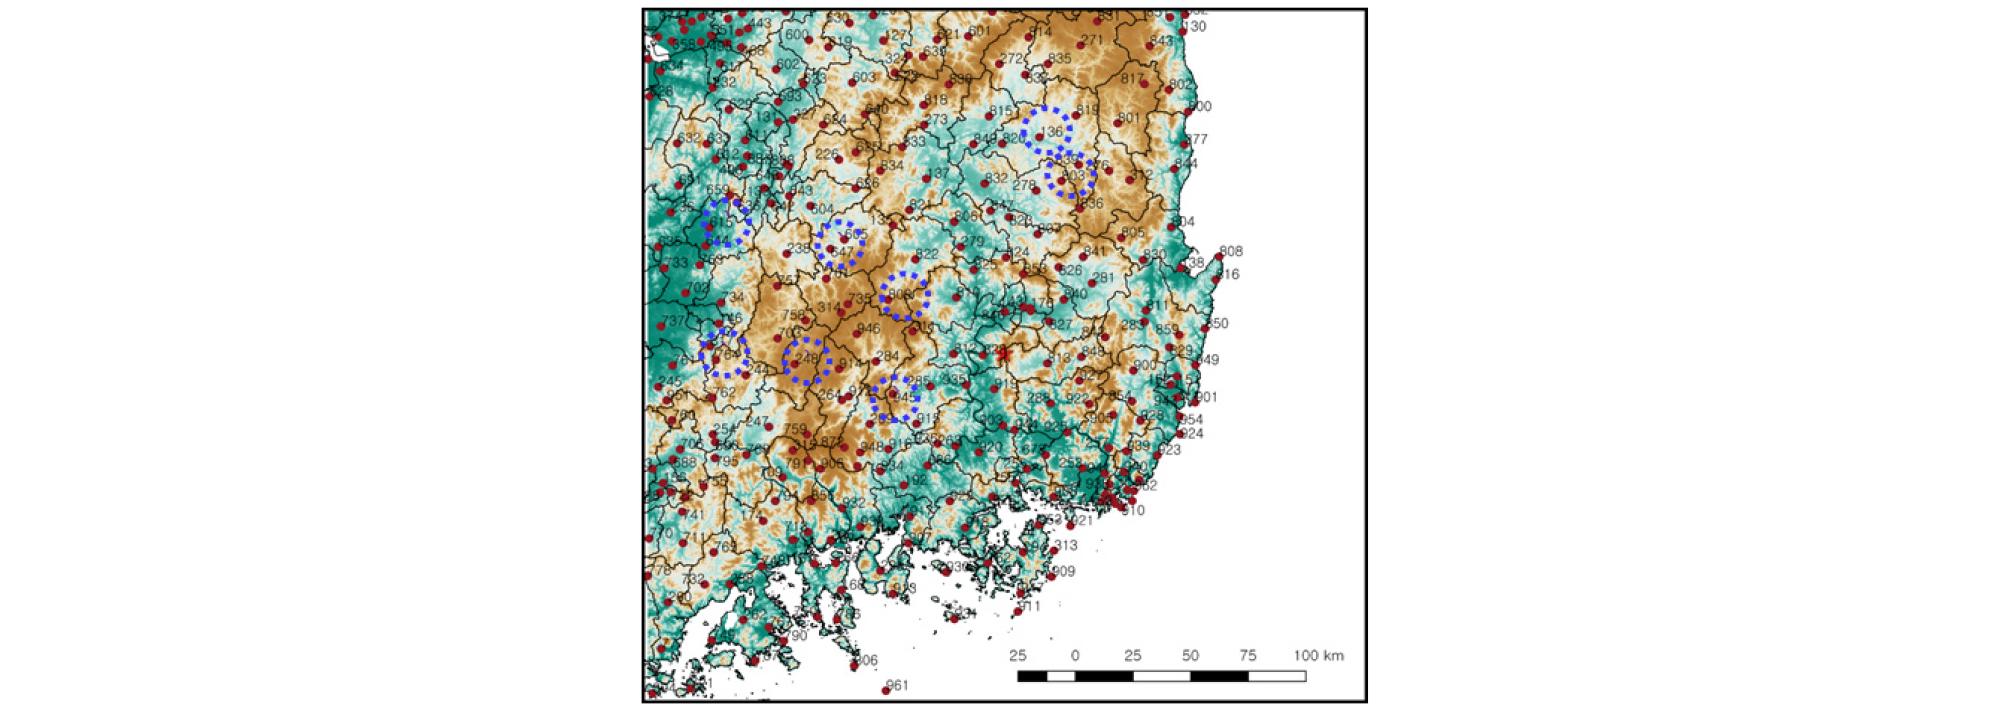 http://static.apub.kr/journalsite/sites/kwra/2020-053-04/N0200530408/images/kwra_53_04_08_F5.jpg